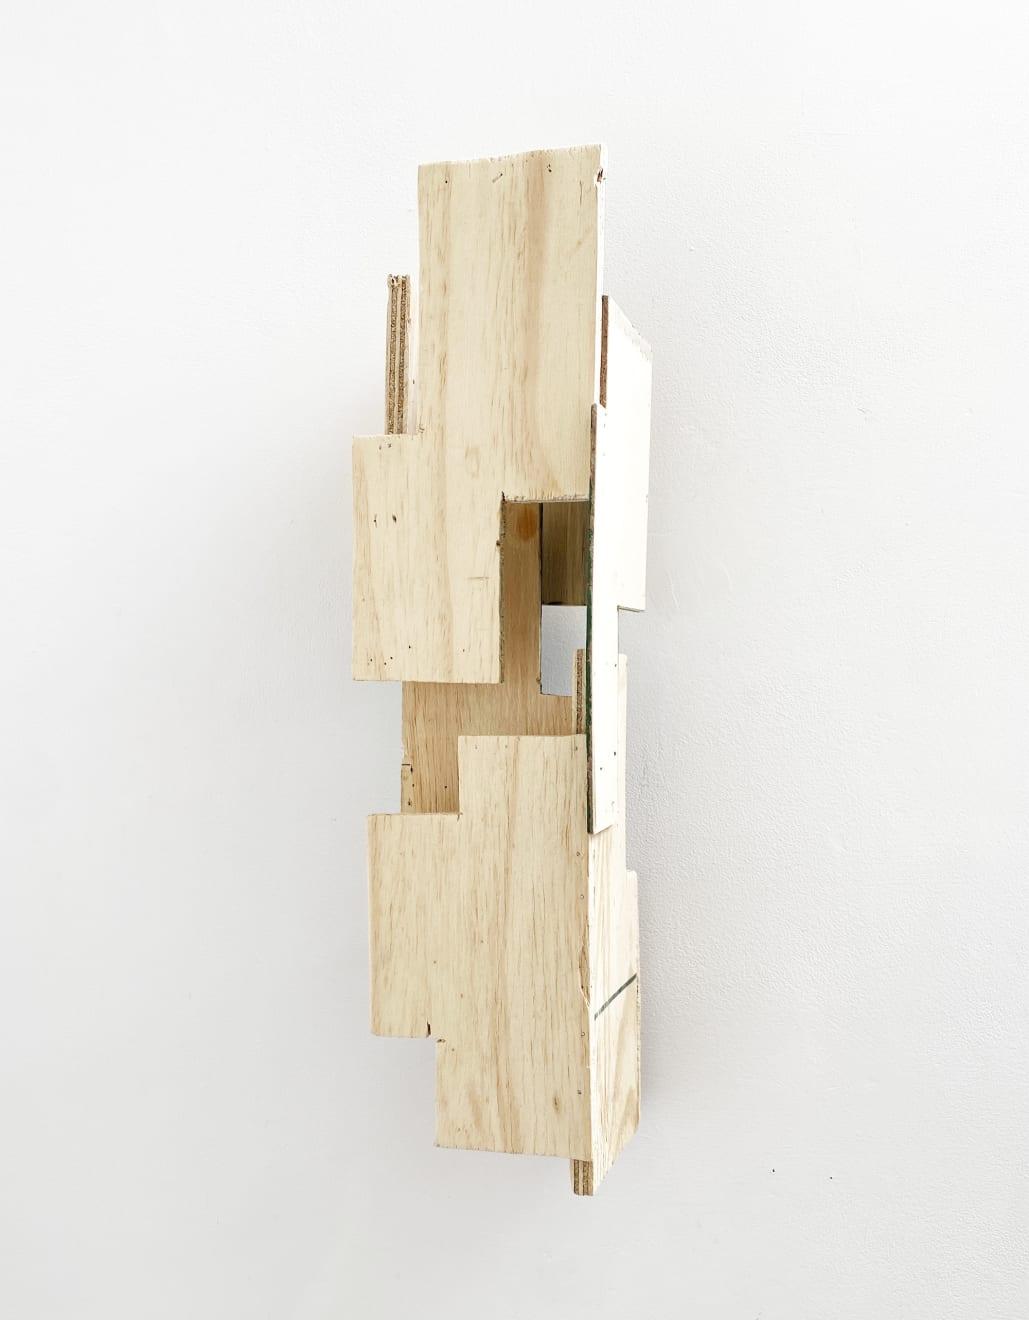 Sign 1, Assemblage, H.50cm, Reclaimed wood, Jane Morter